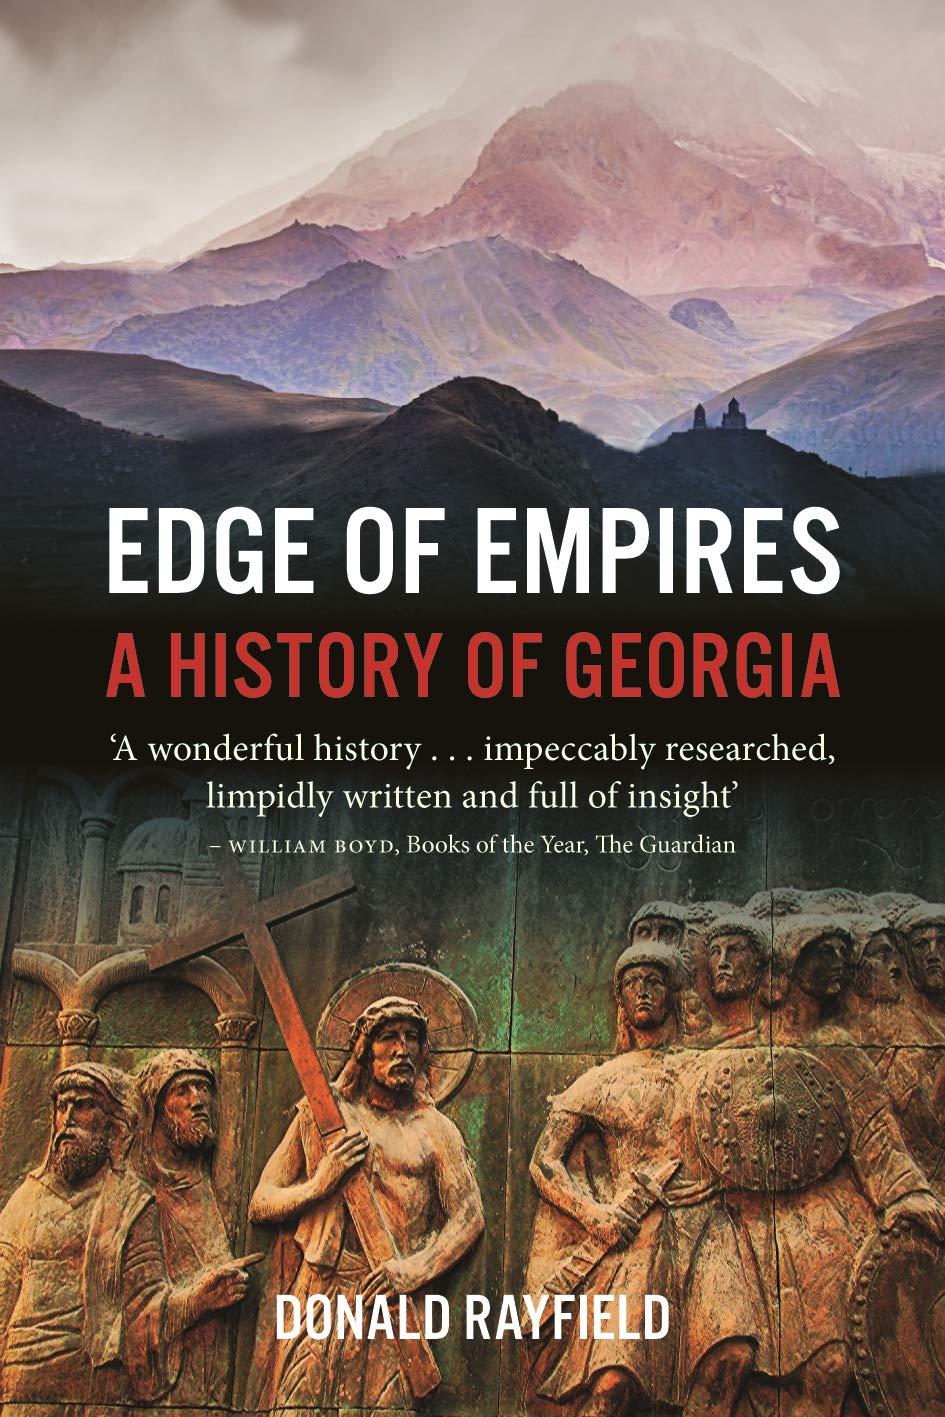 Download e-book Edge of Empires: A History of Georgia